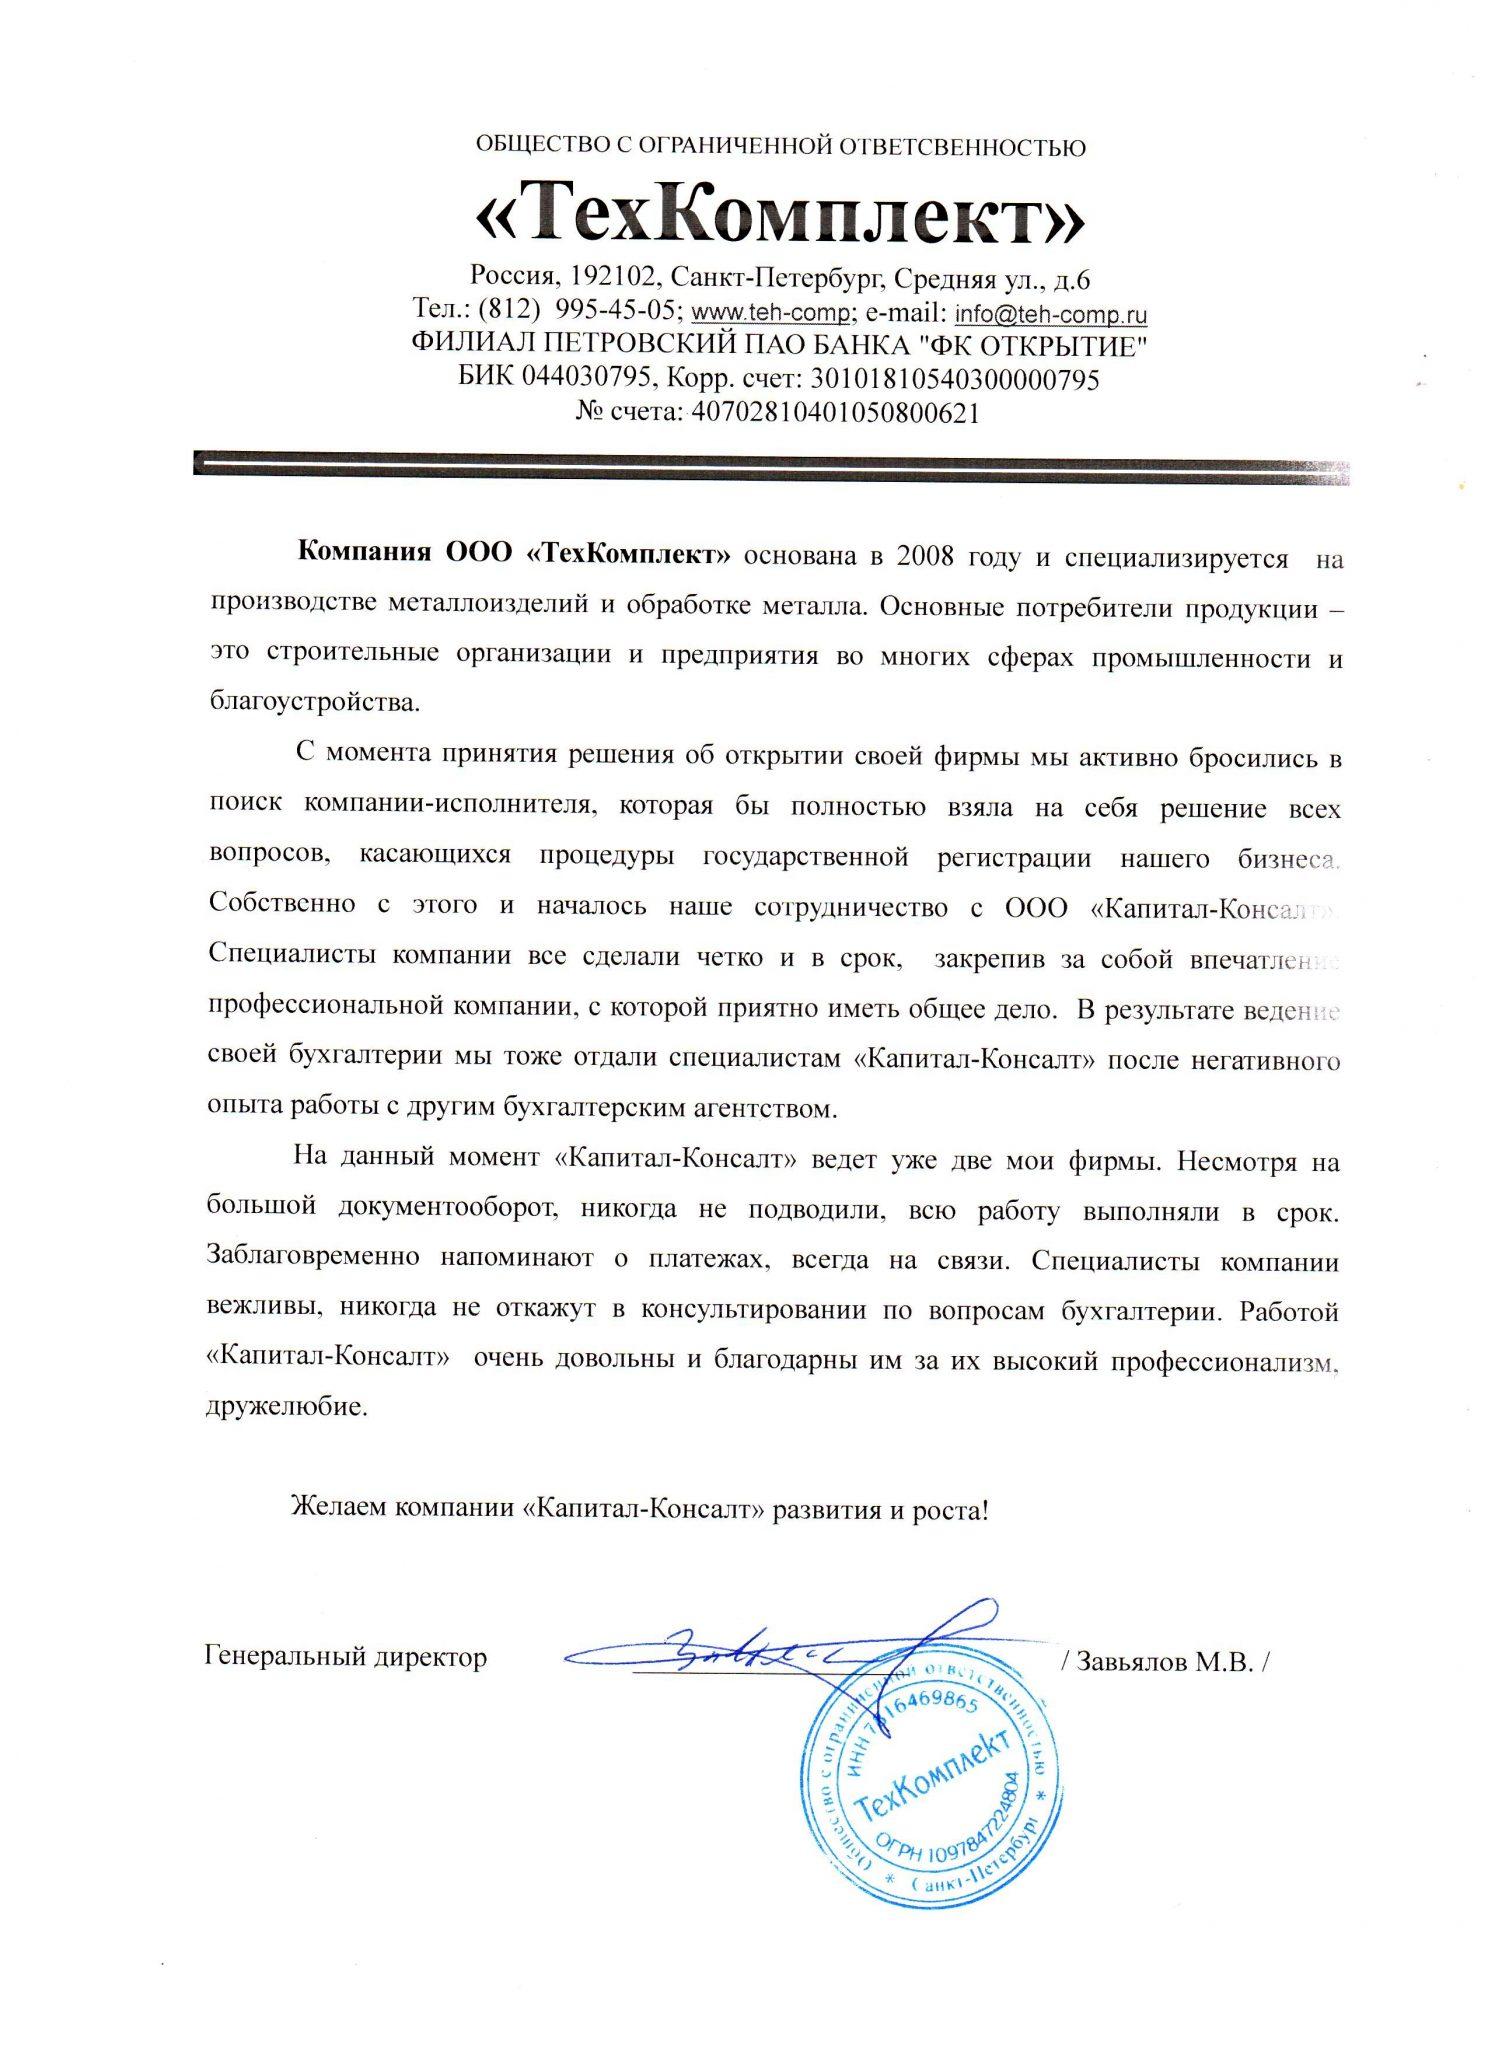 ООО-ТехКомплект